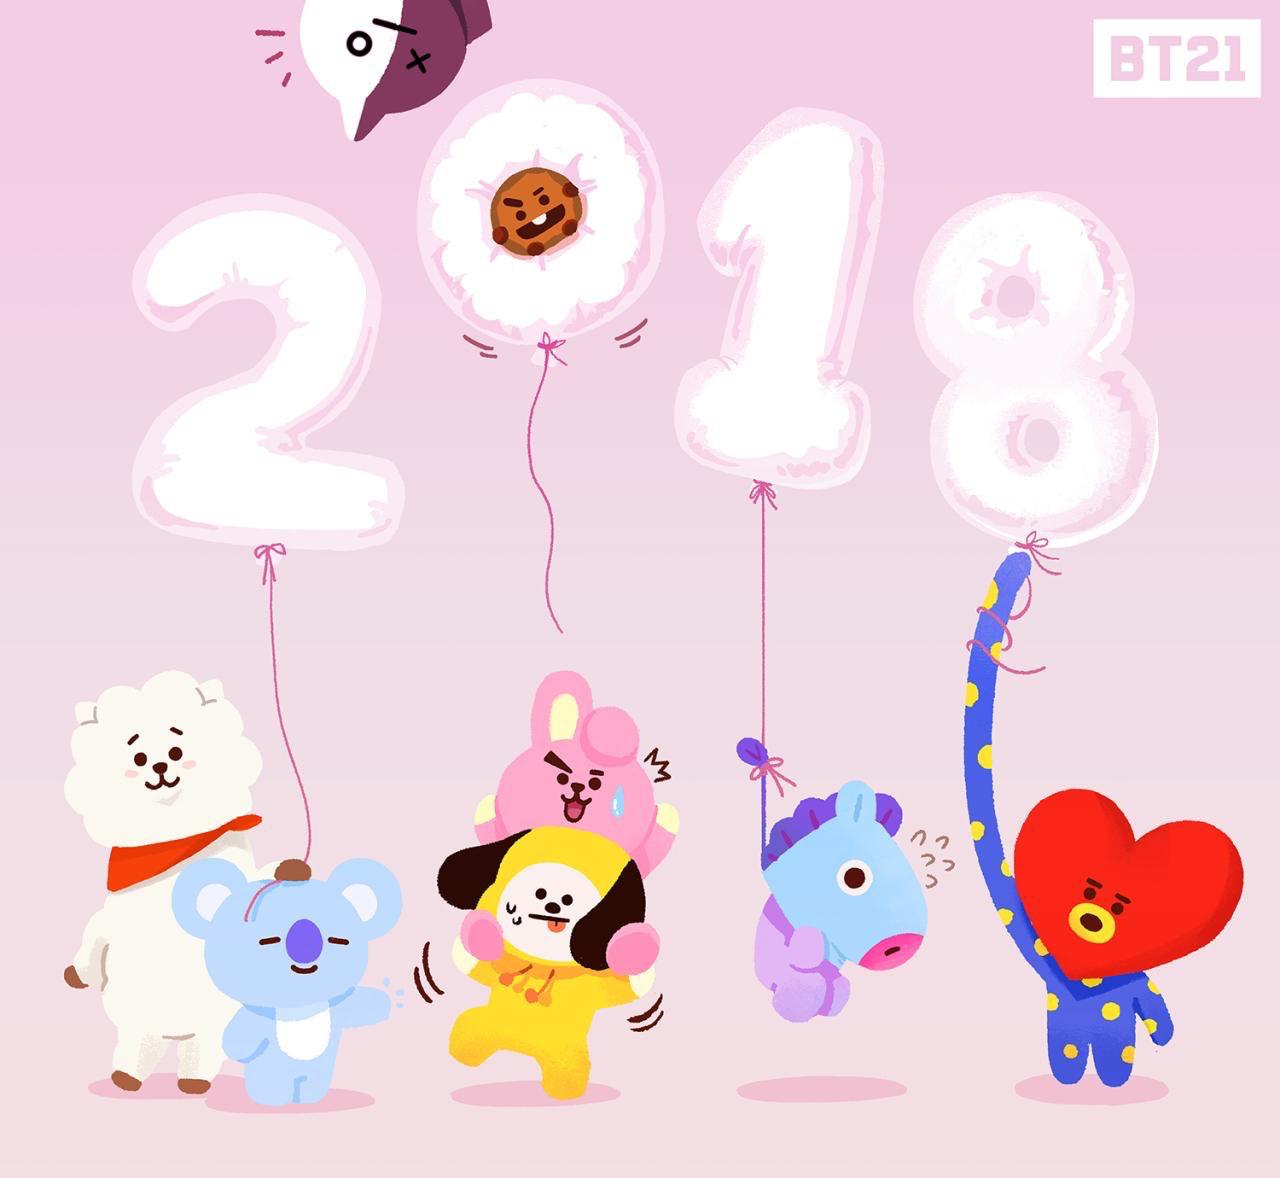 Bts 防弾少年団 Bt21 Happy New Year 2018 Bts 防弾少年団